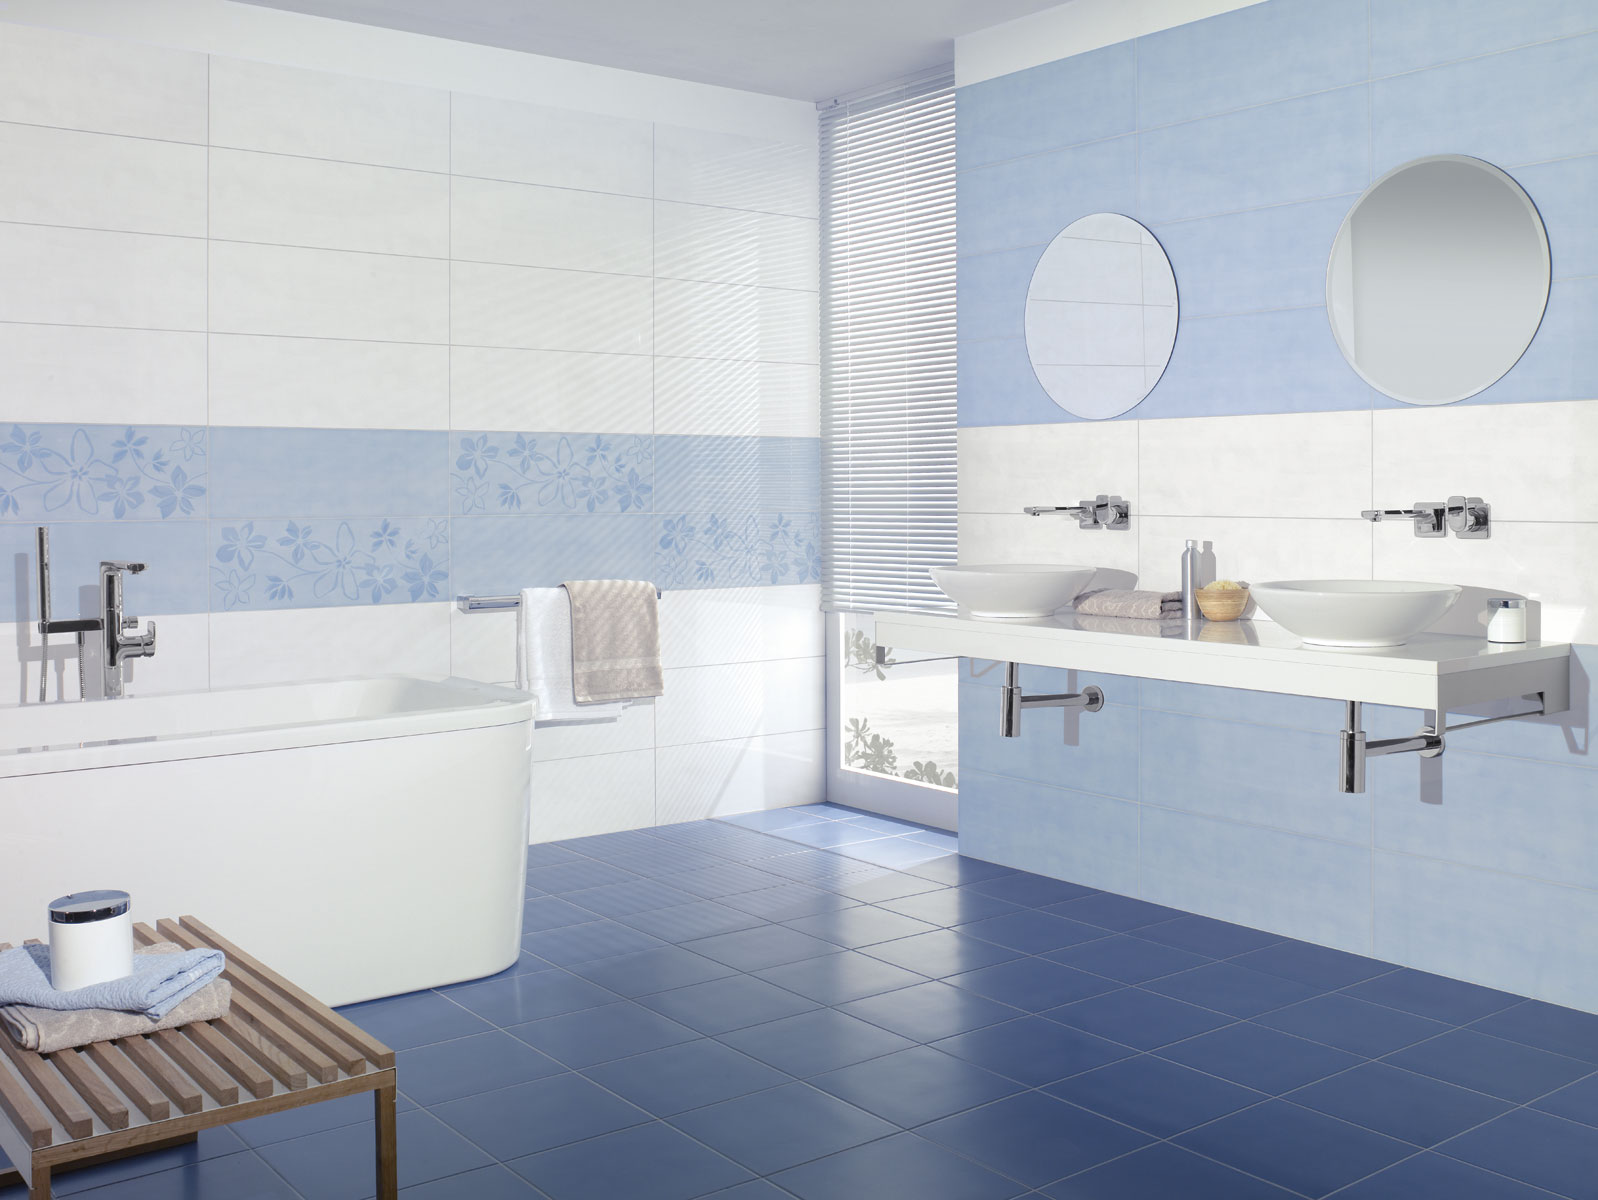 Peinture carrelage bleu lagon - Livreetvin.fr